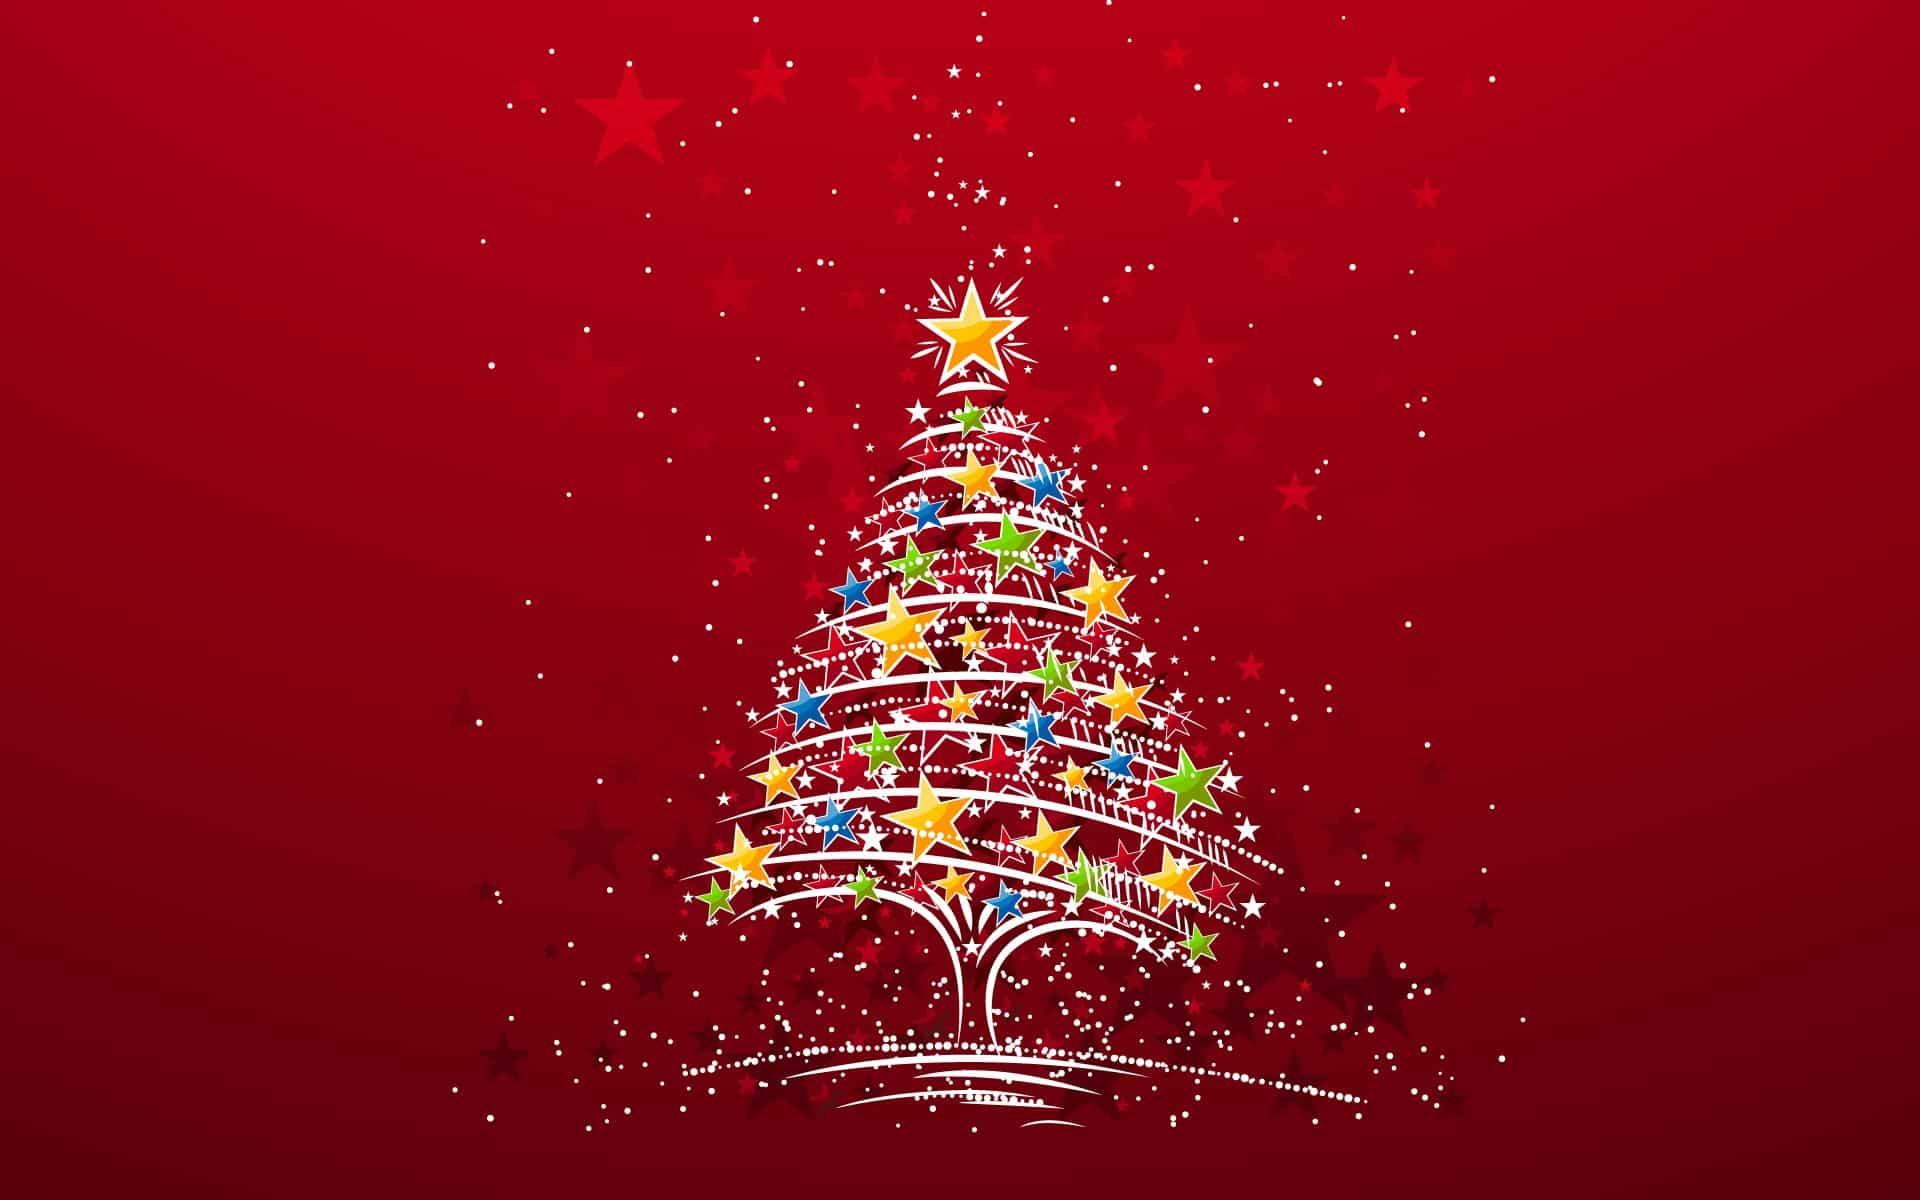 Wall E And Eve Christmas Ornament